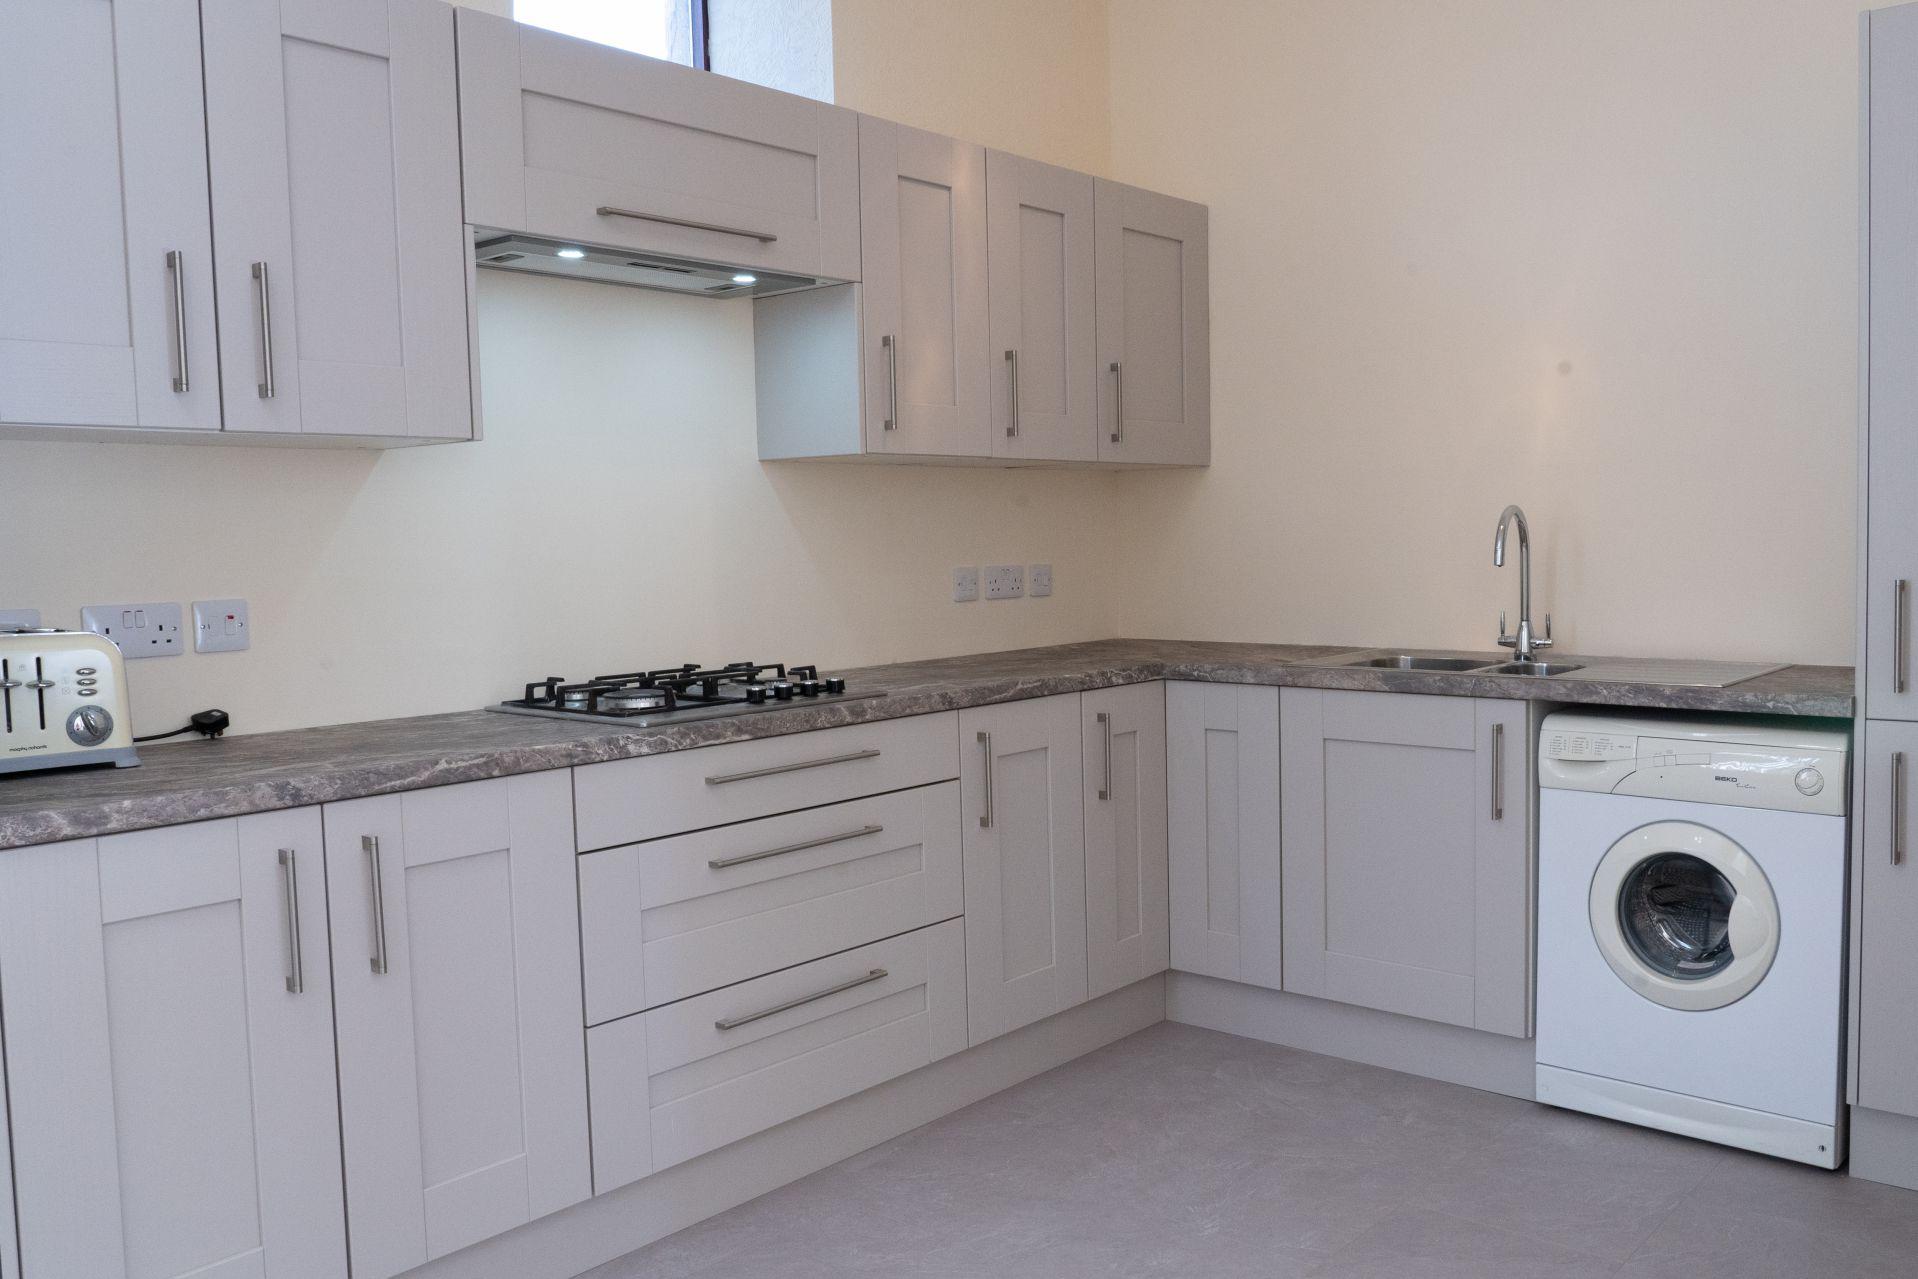 ARD-Properties-Development-Sites-Buy-Homes-Rent-Aberdeenshire-Rentals-2a-St-Andrew-Streeet-Peterhead-Banner (10)